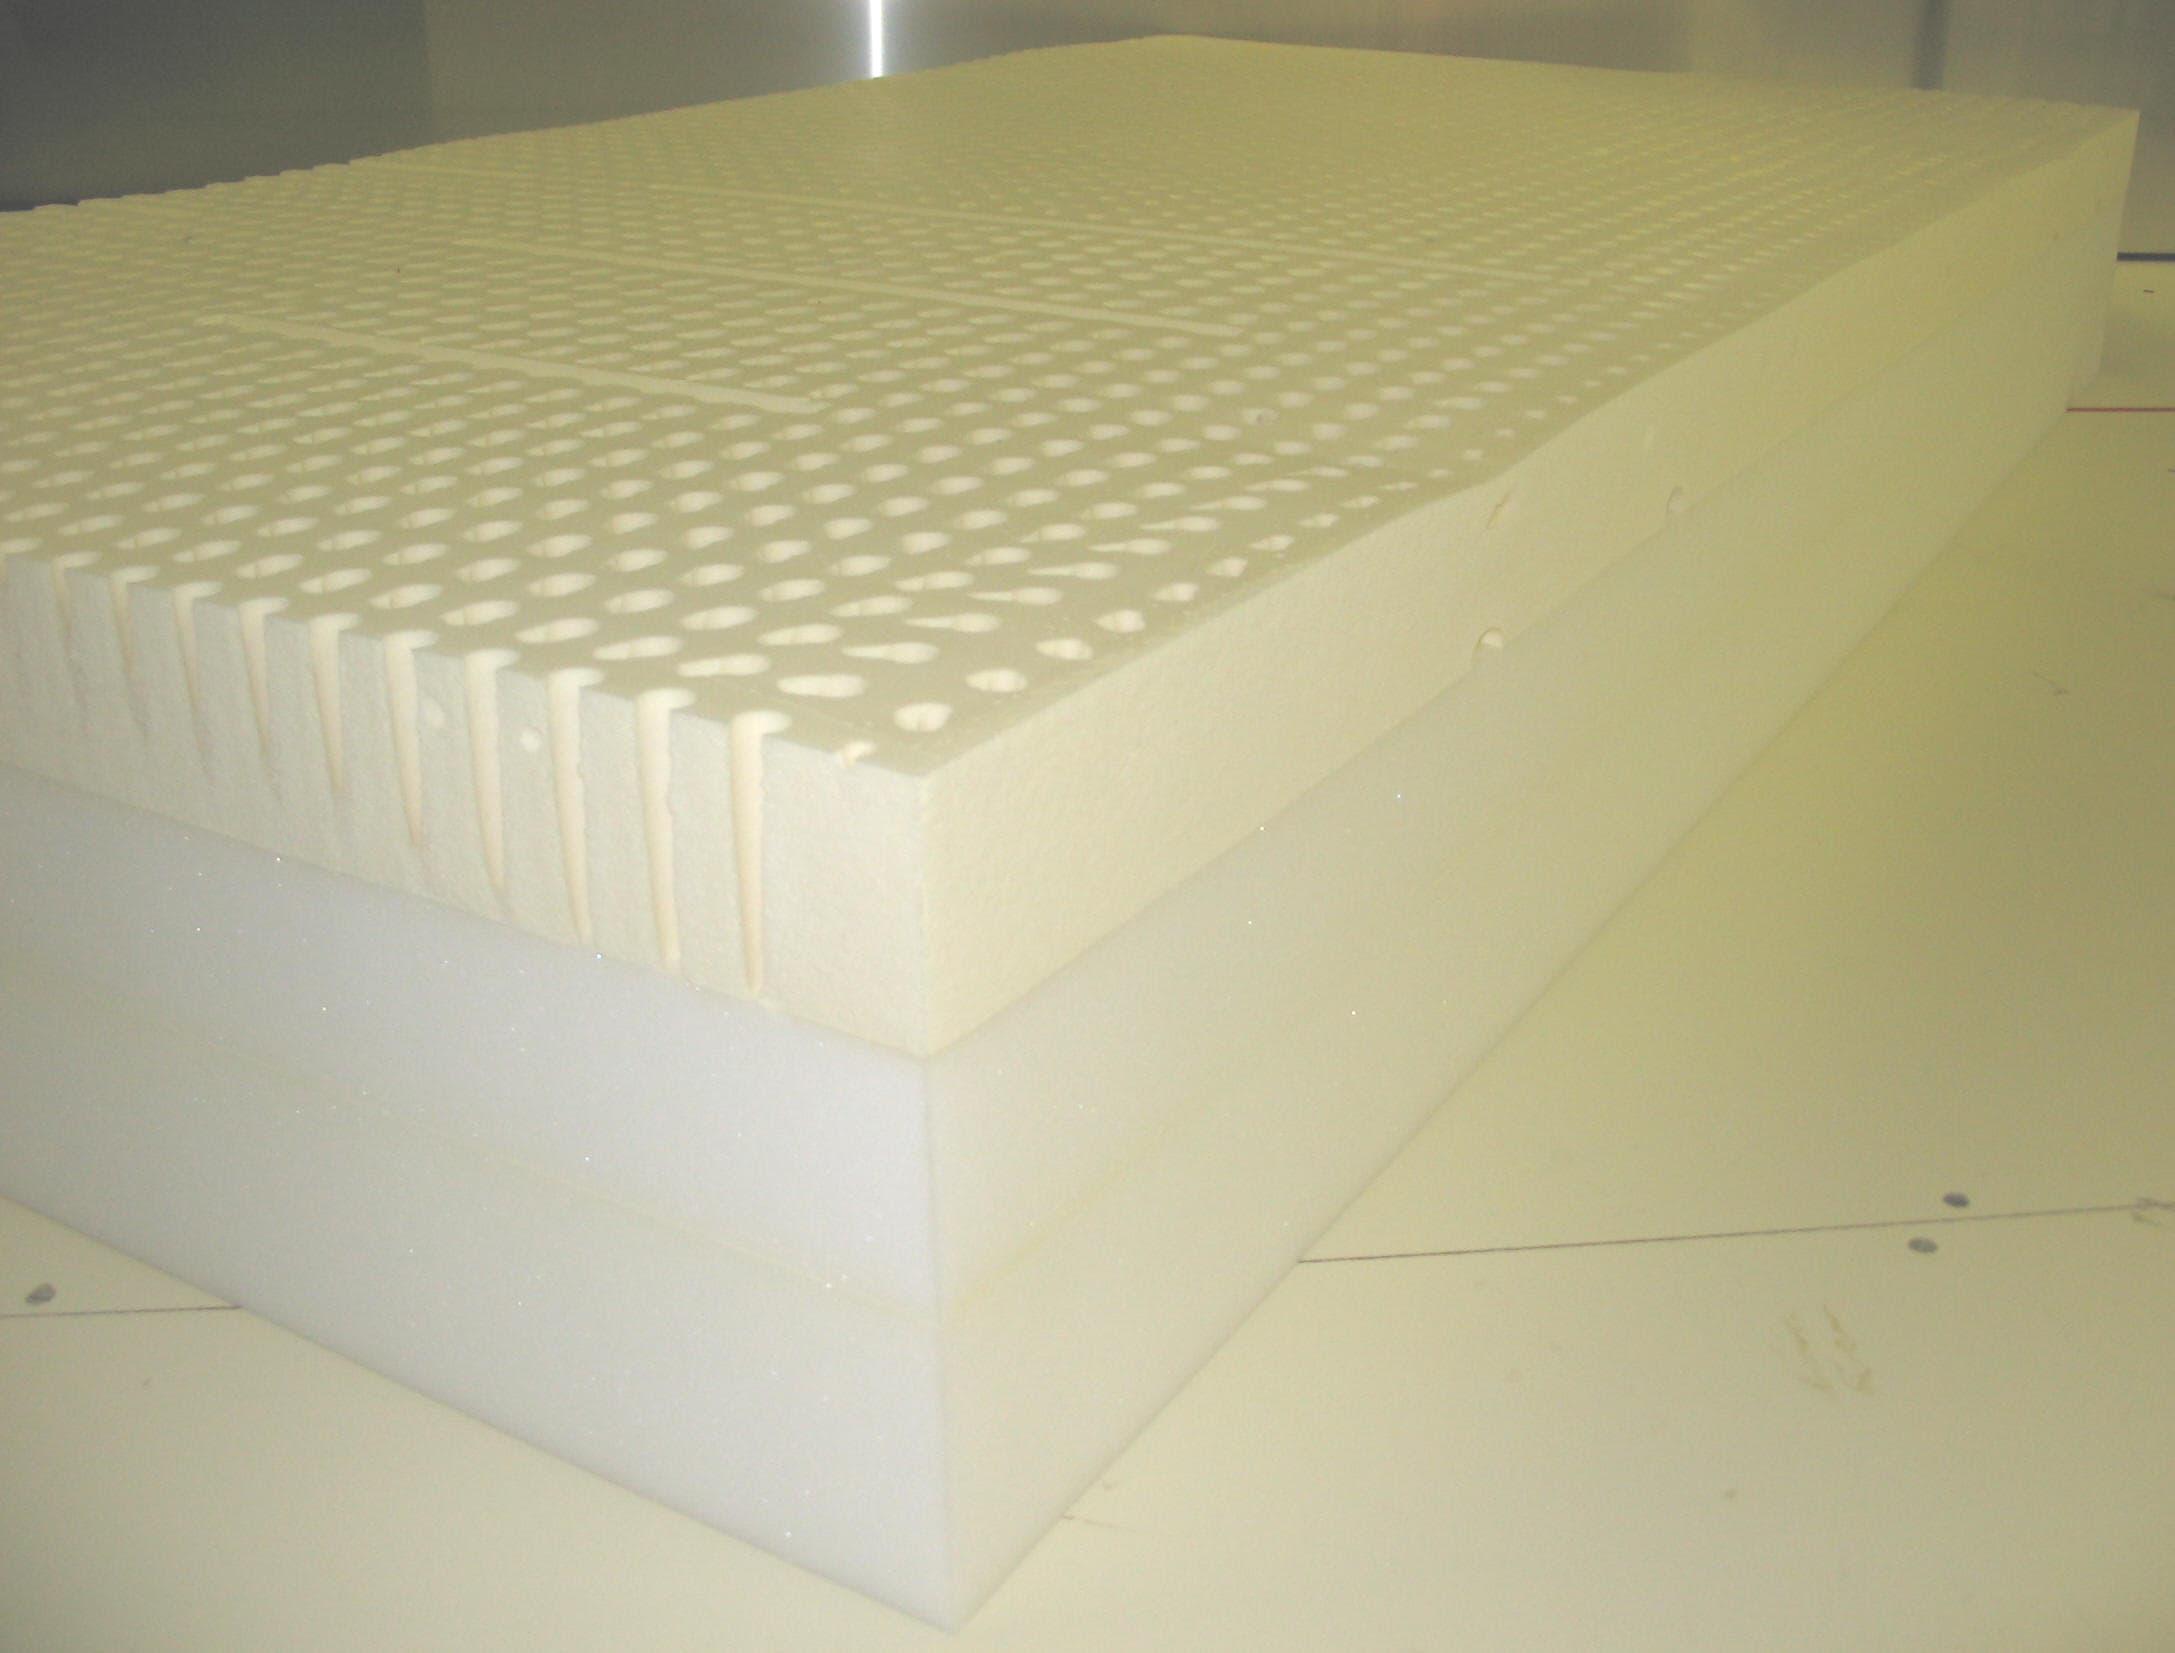 Fullsize Of How To Cut Foam